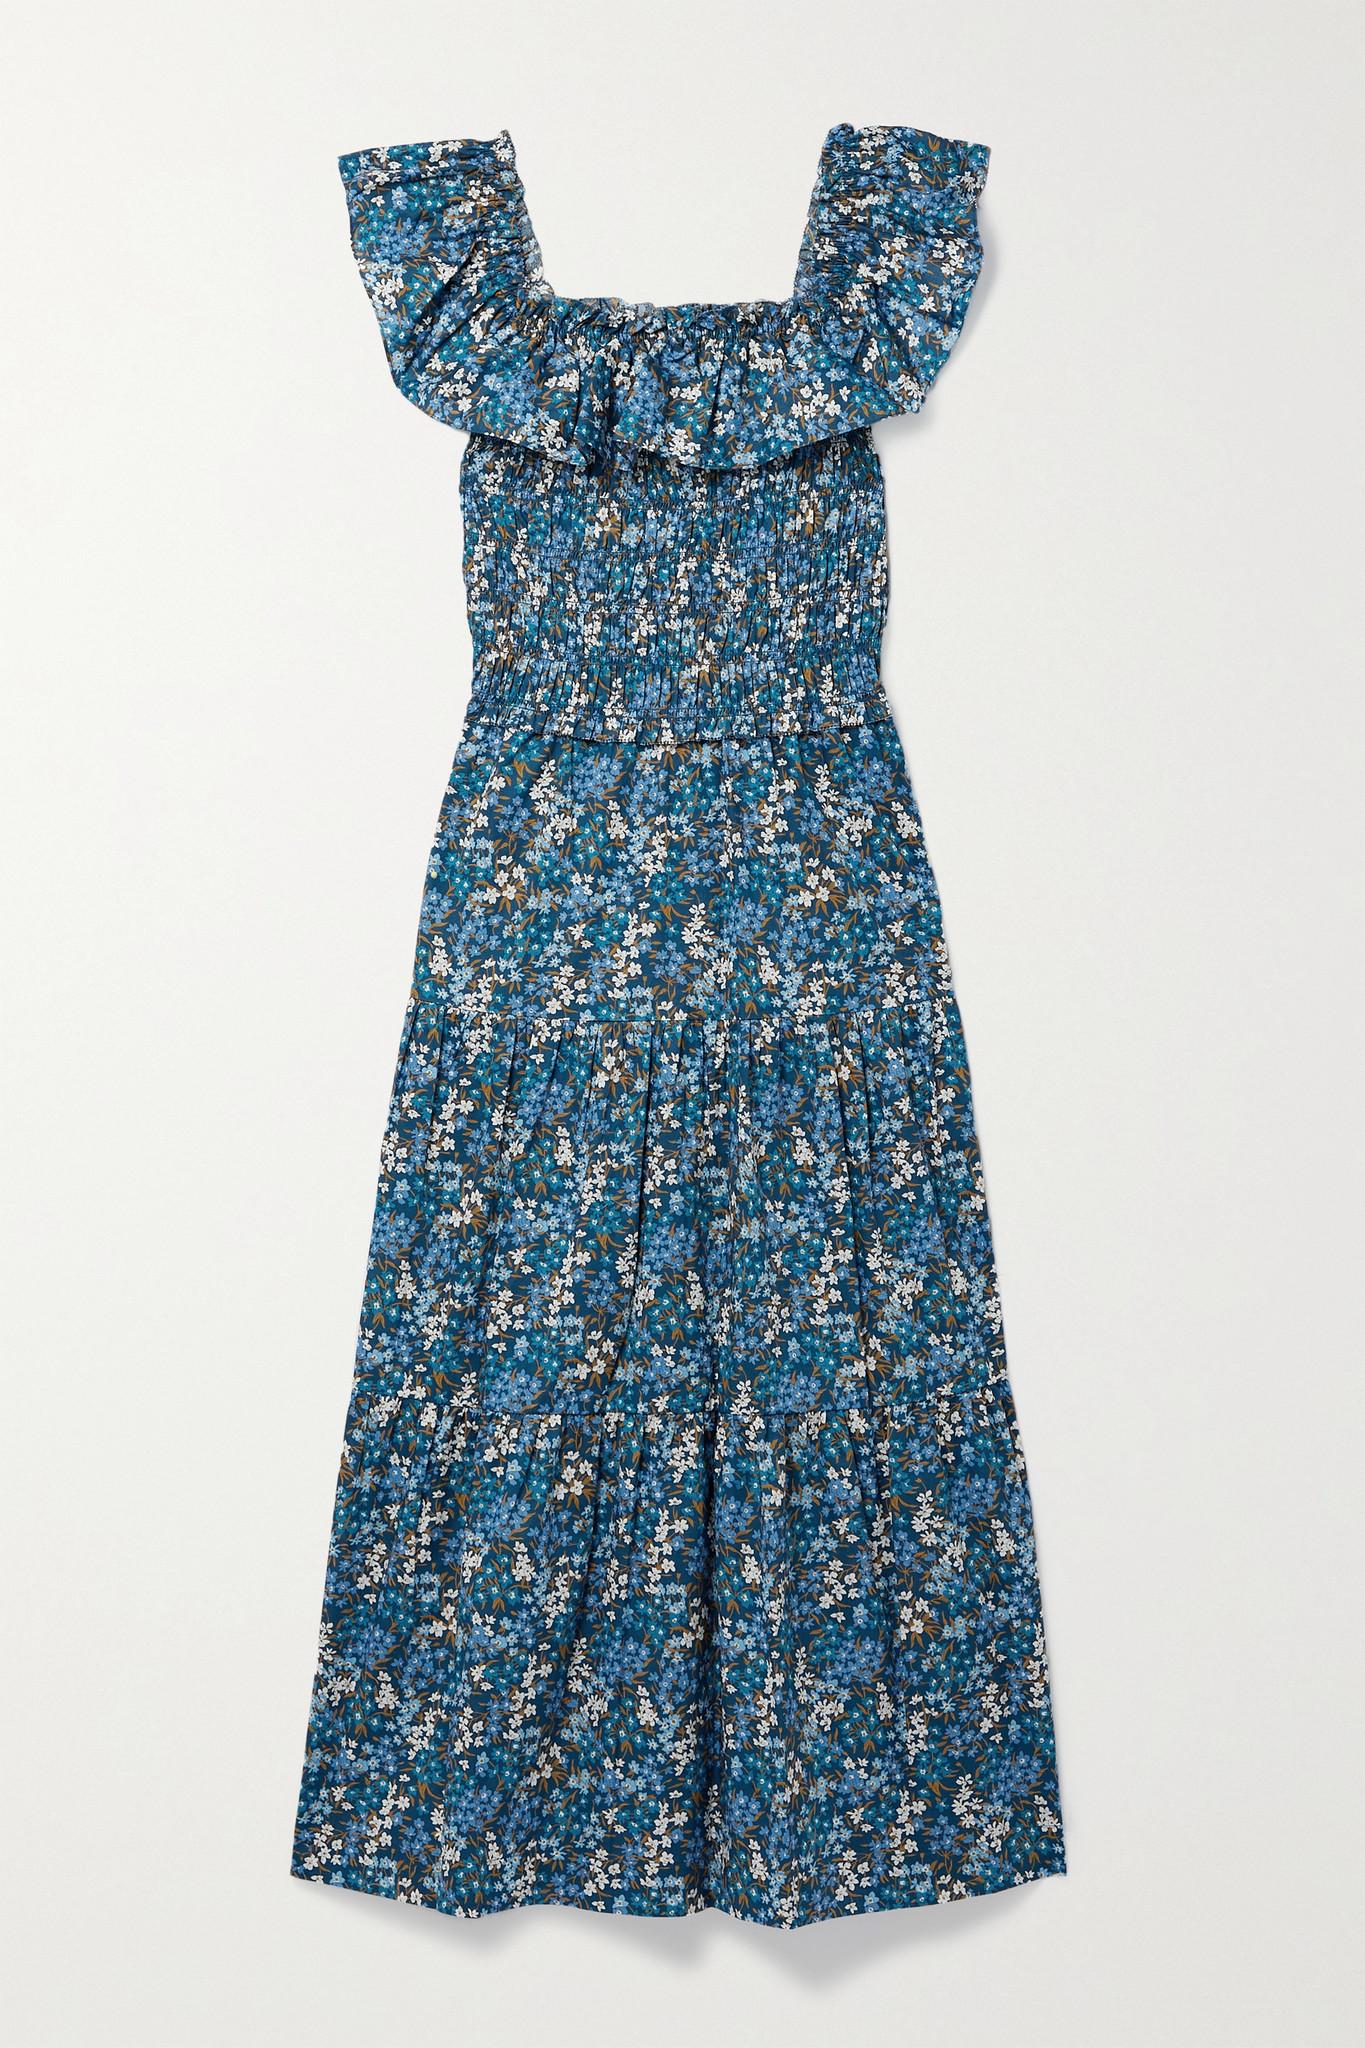 SEA - Lissa Liberty 荷叶边花卉印花纯棉巴里纱中长连衣裙 - 蓝色 - x small